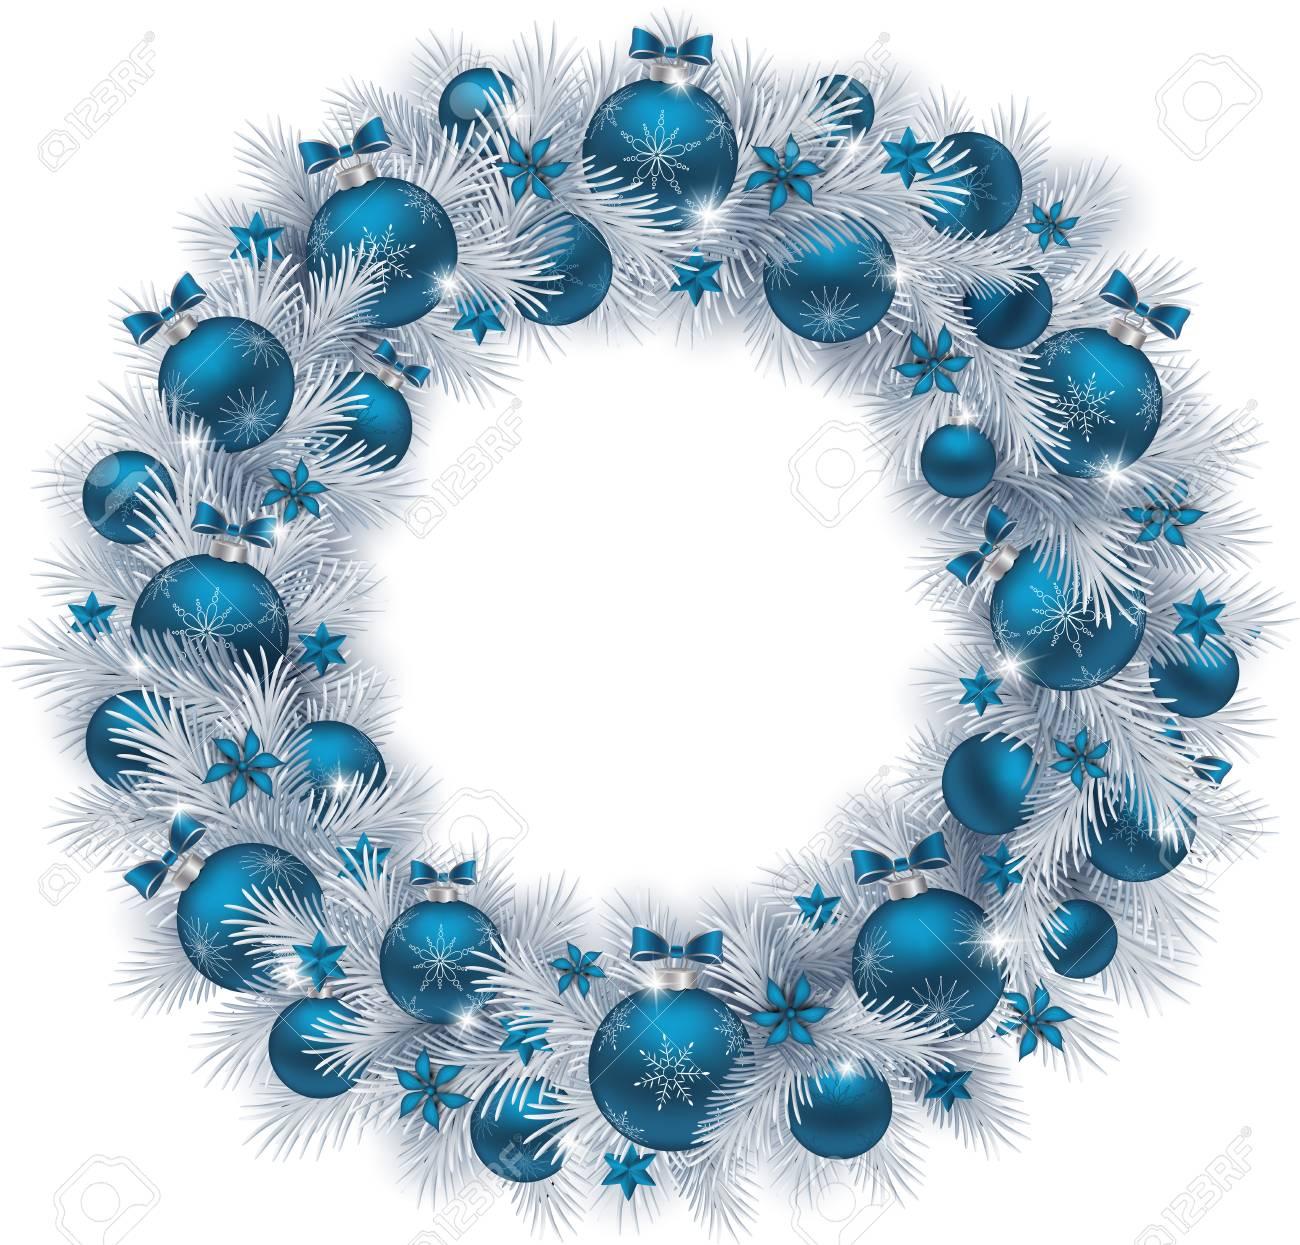 Silver Christmas Wreath.Christmas Wreath With Silver Colour Fir Branches Blue Balls